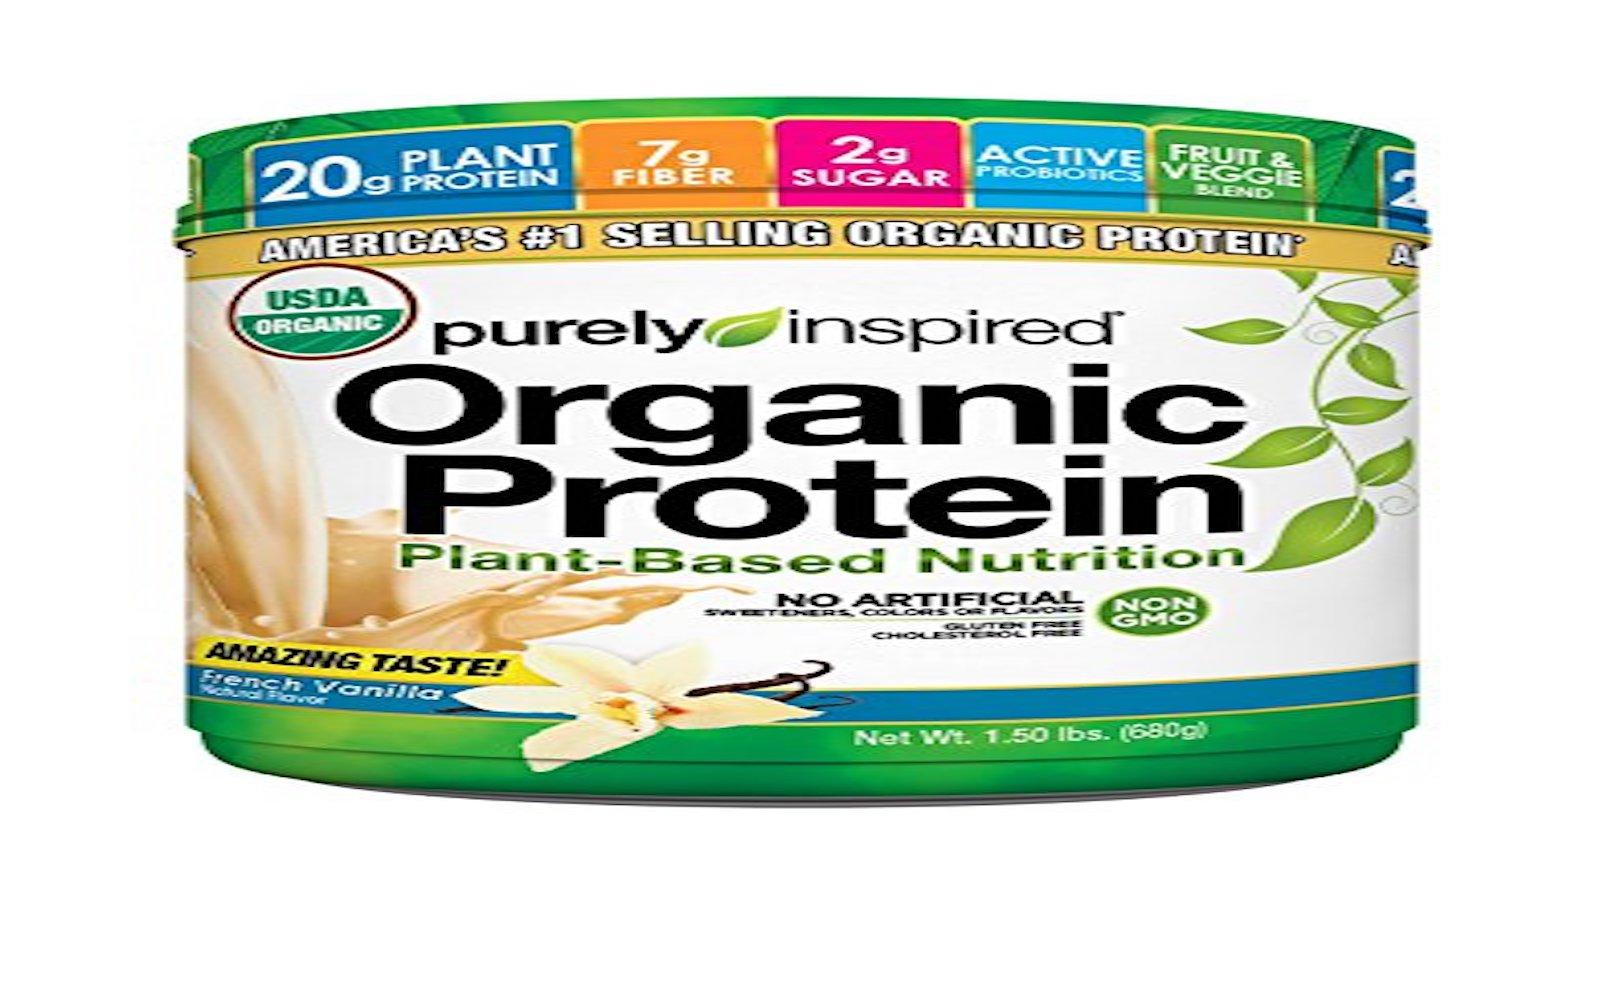 purely inspired organic protein vegan powder